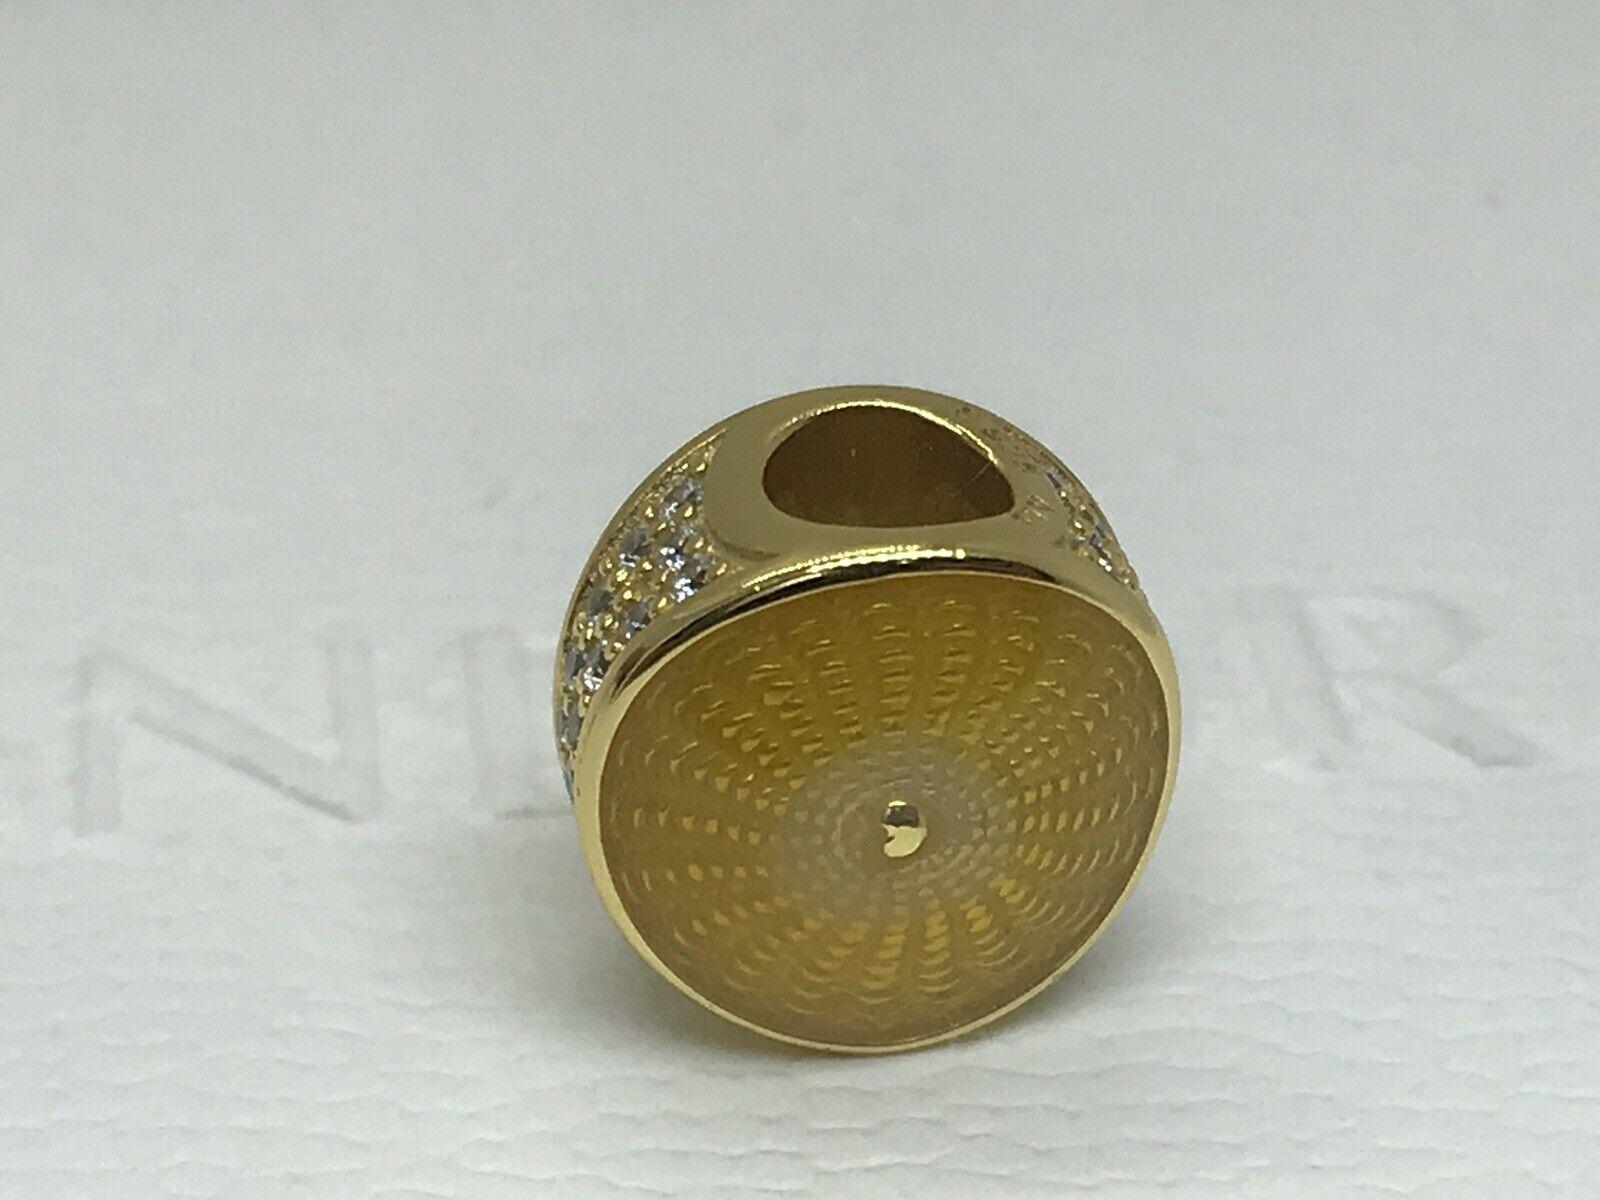 SUN MEDALLION/_Bead for Silver European Charm Bracelet/_Sunshine Ray Light Day/_U26